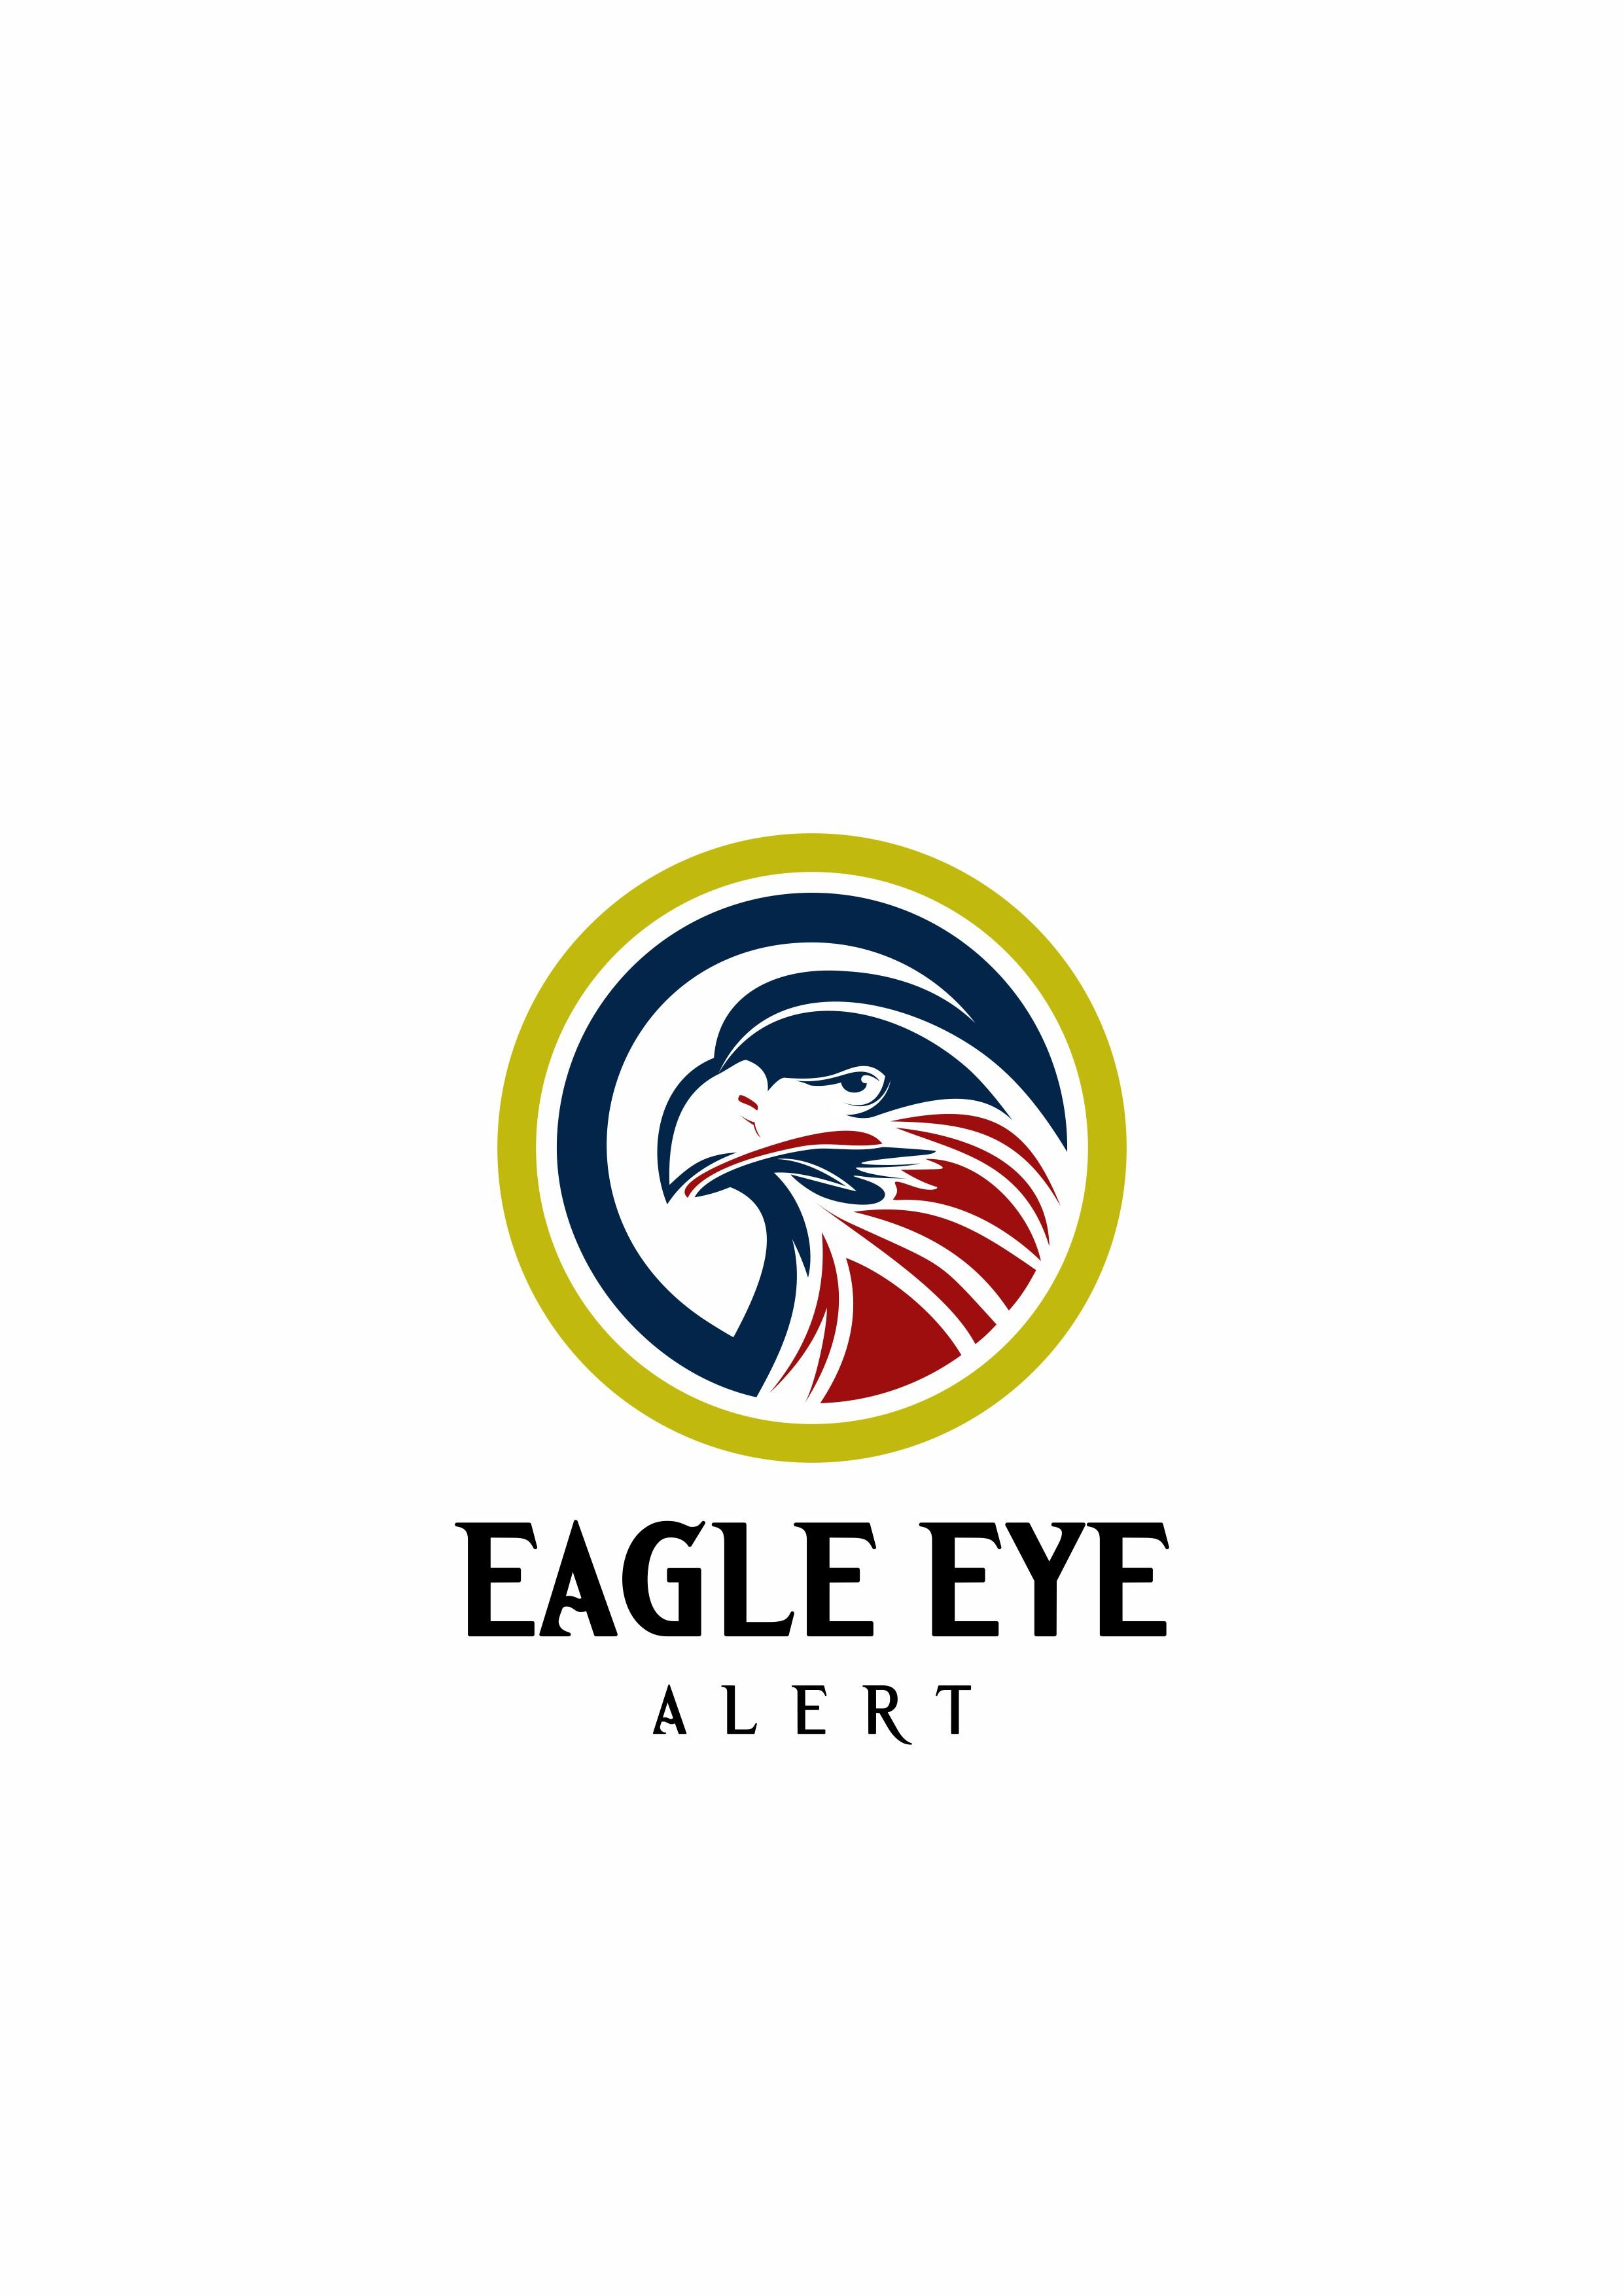 Eagle Eye Alert! A community service, first responder service Dot com start up needs a killer logo!